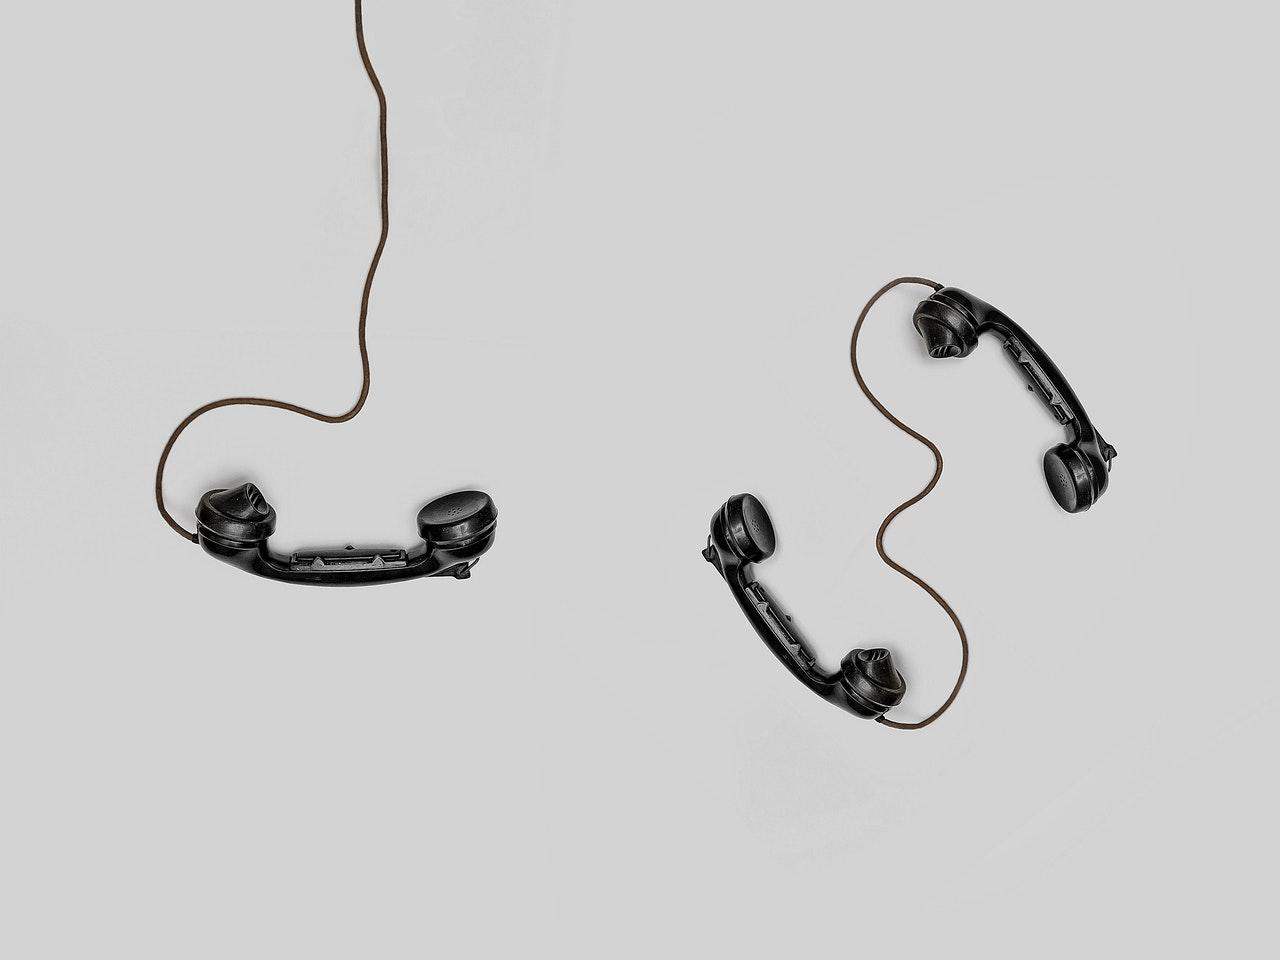 Telefon Santrali Servis Hizmetlerinde Kalite